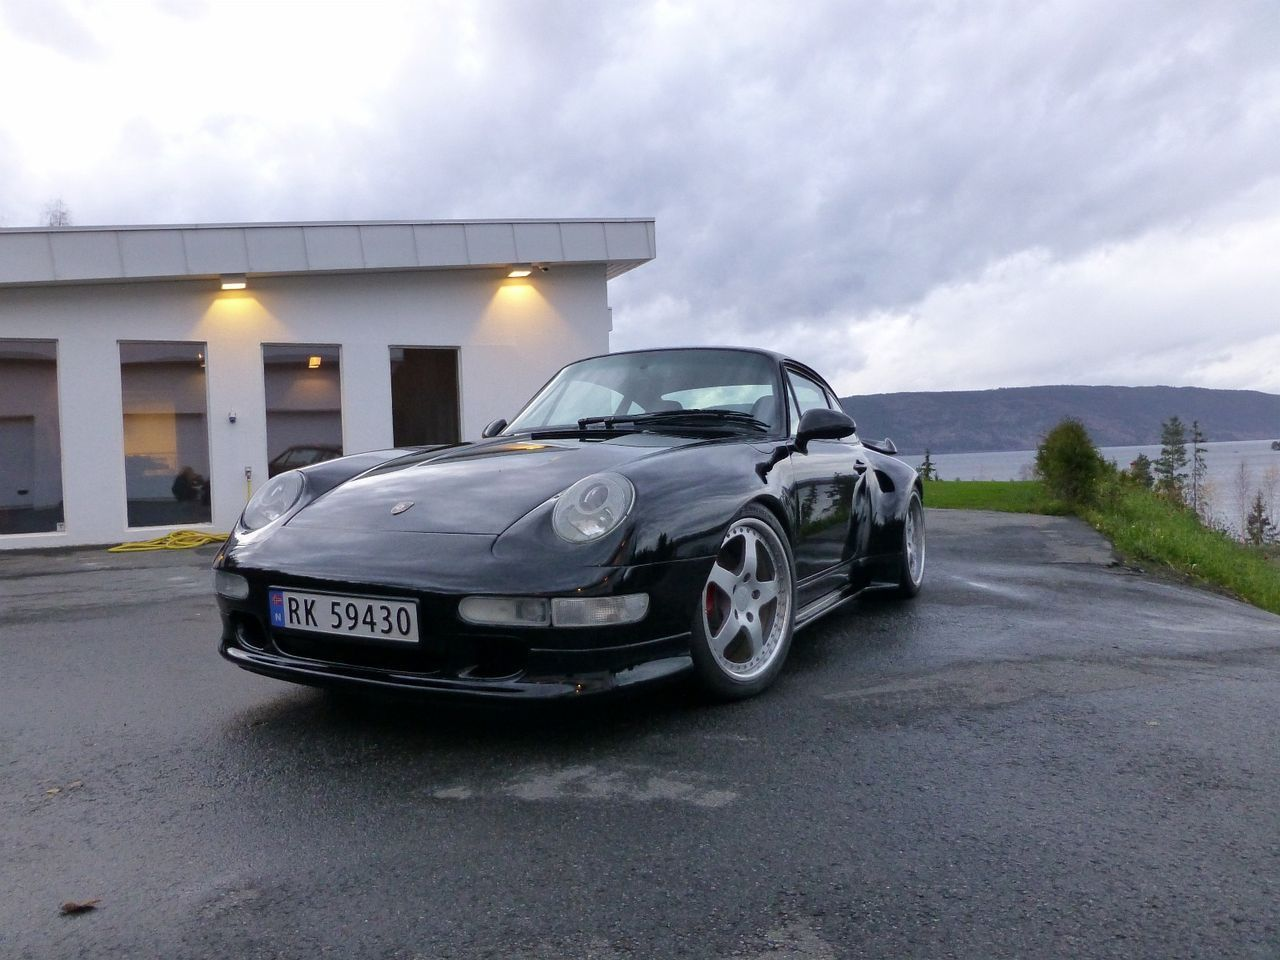 Awesome 1995 Porsche 911 Carrera 2 Custom Widebody 480 Hp 993 W REBUILT 32 Turbo Engine 2017 2018